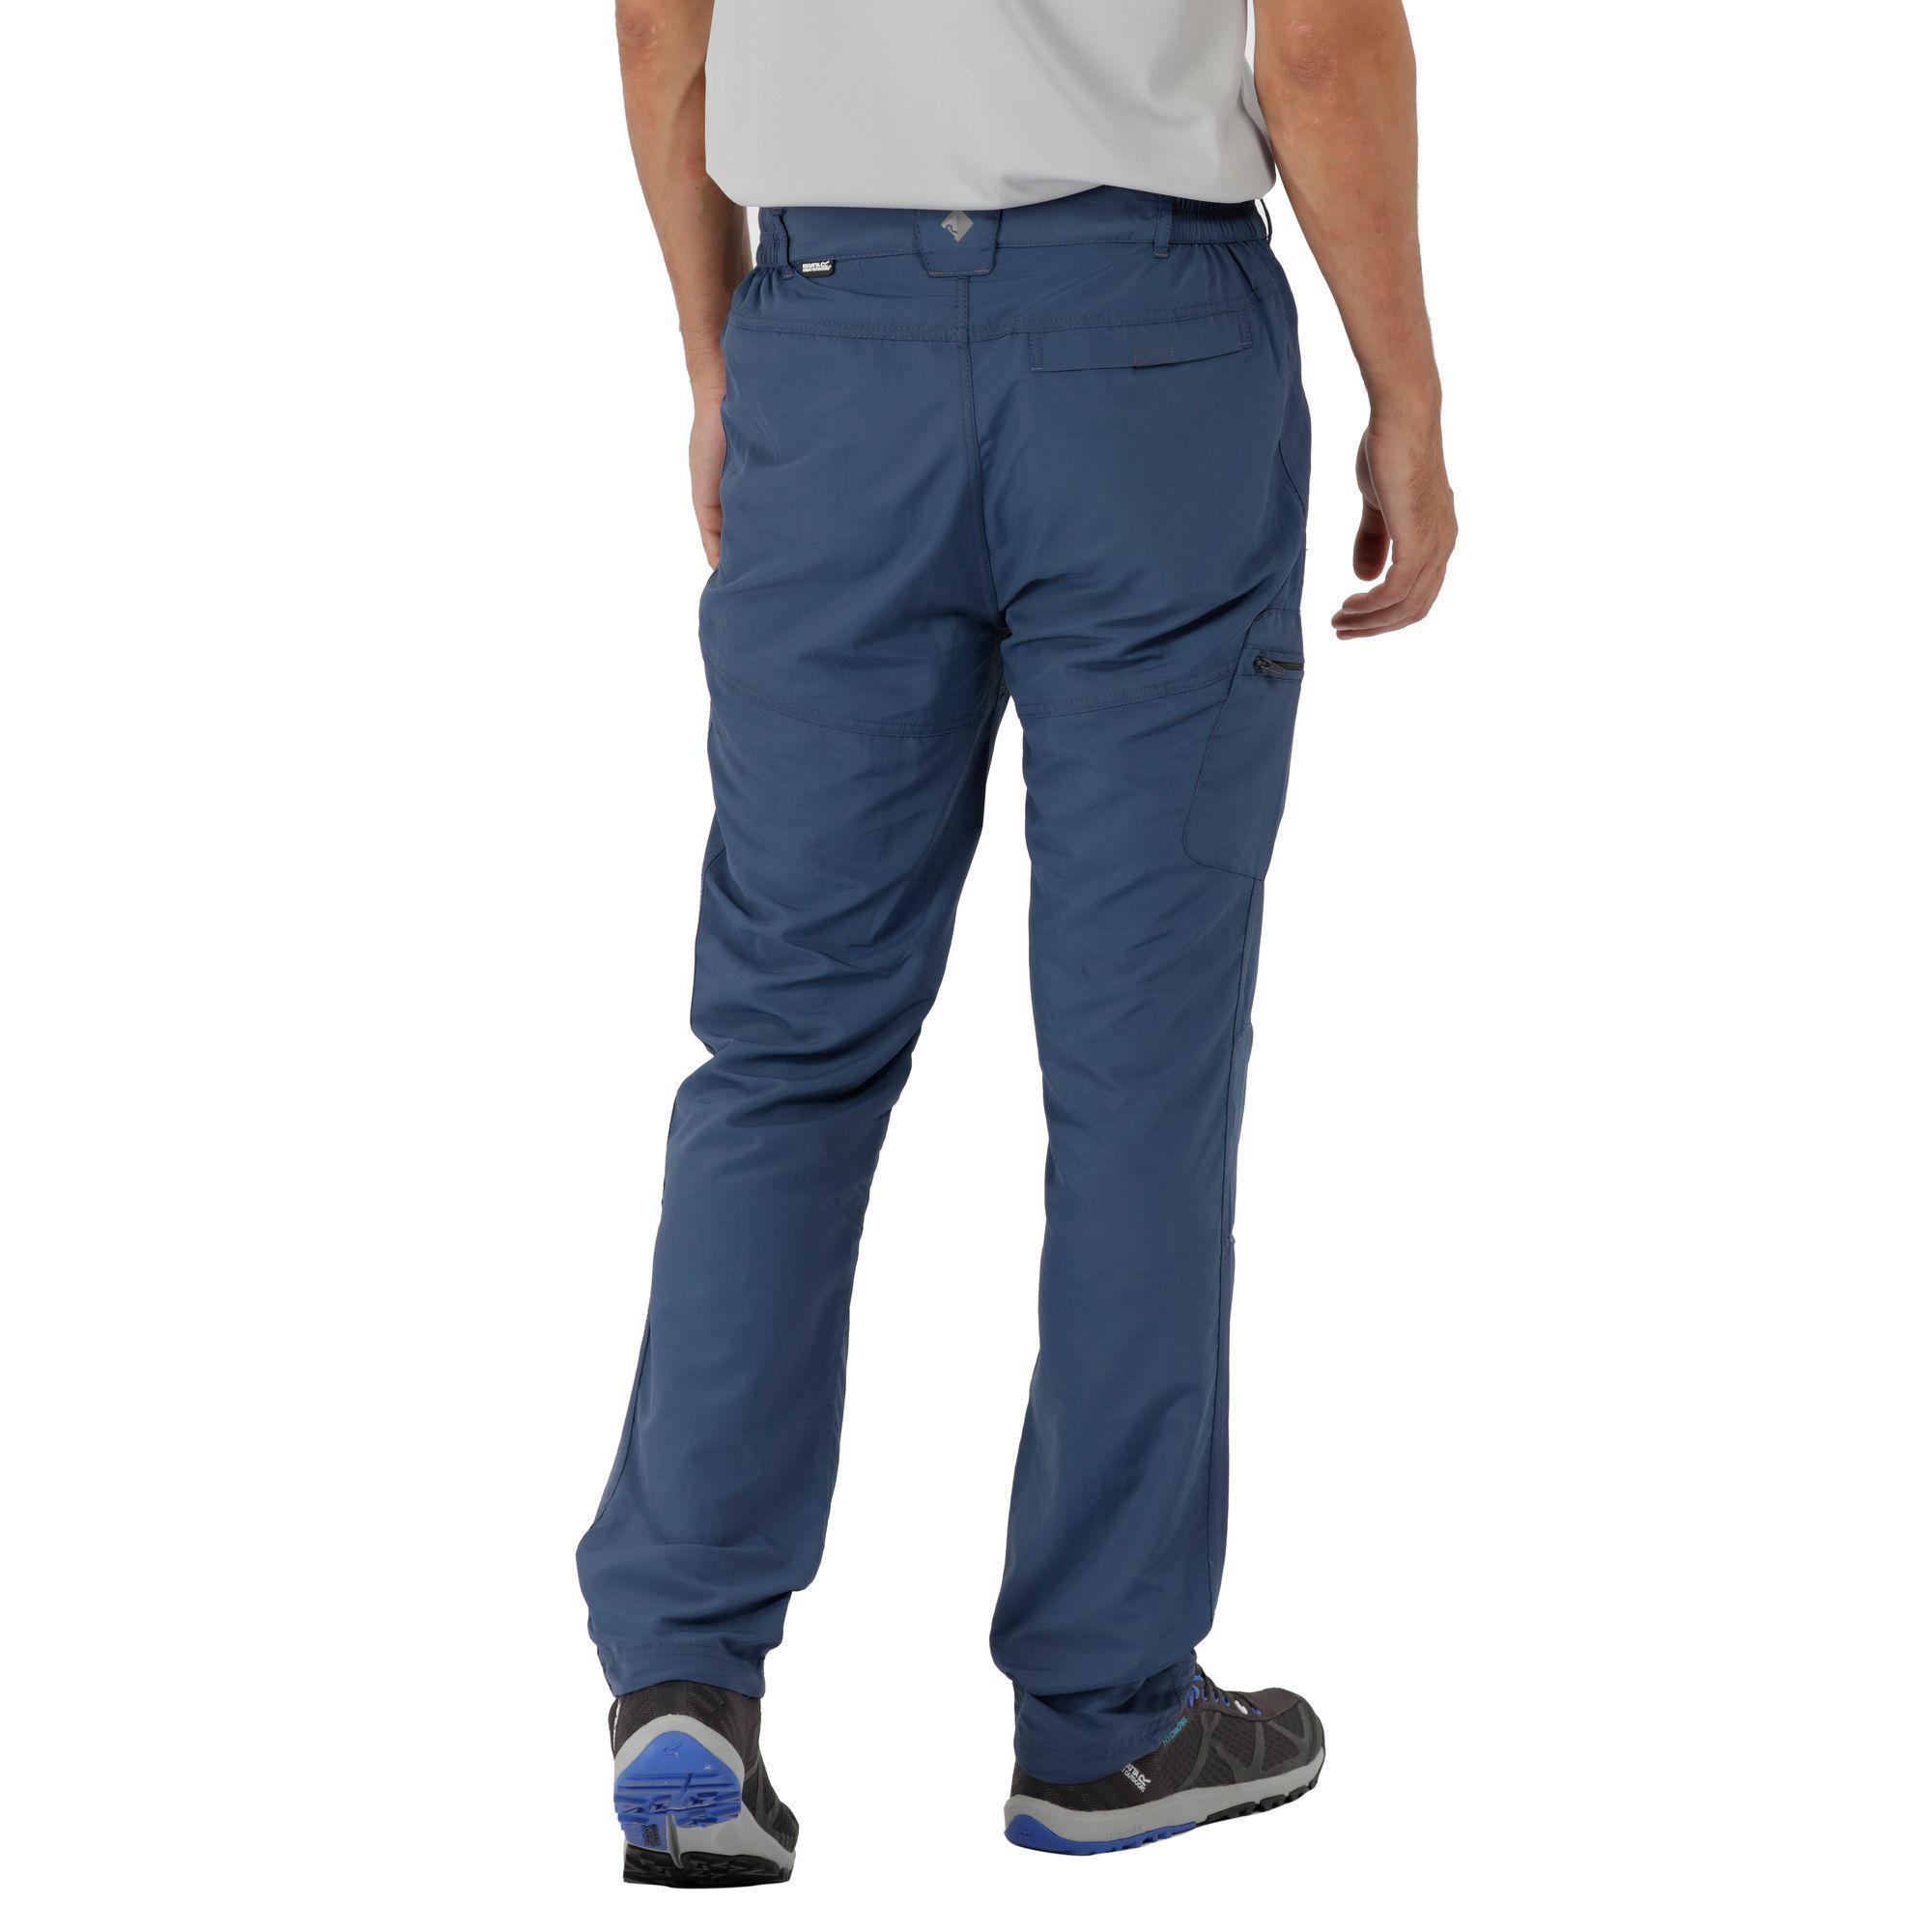 Regatta Synthetic Blue 'leesville' Trousers for Men